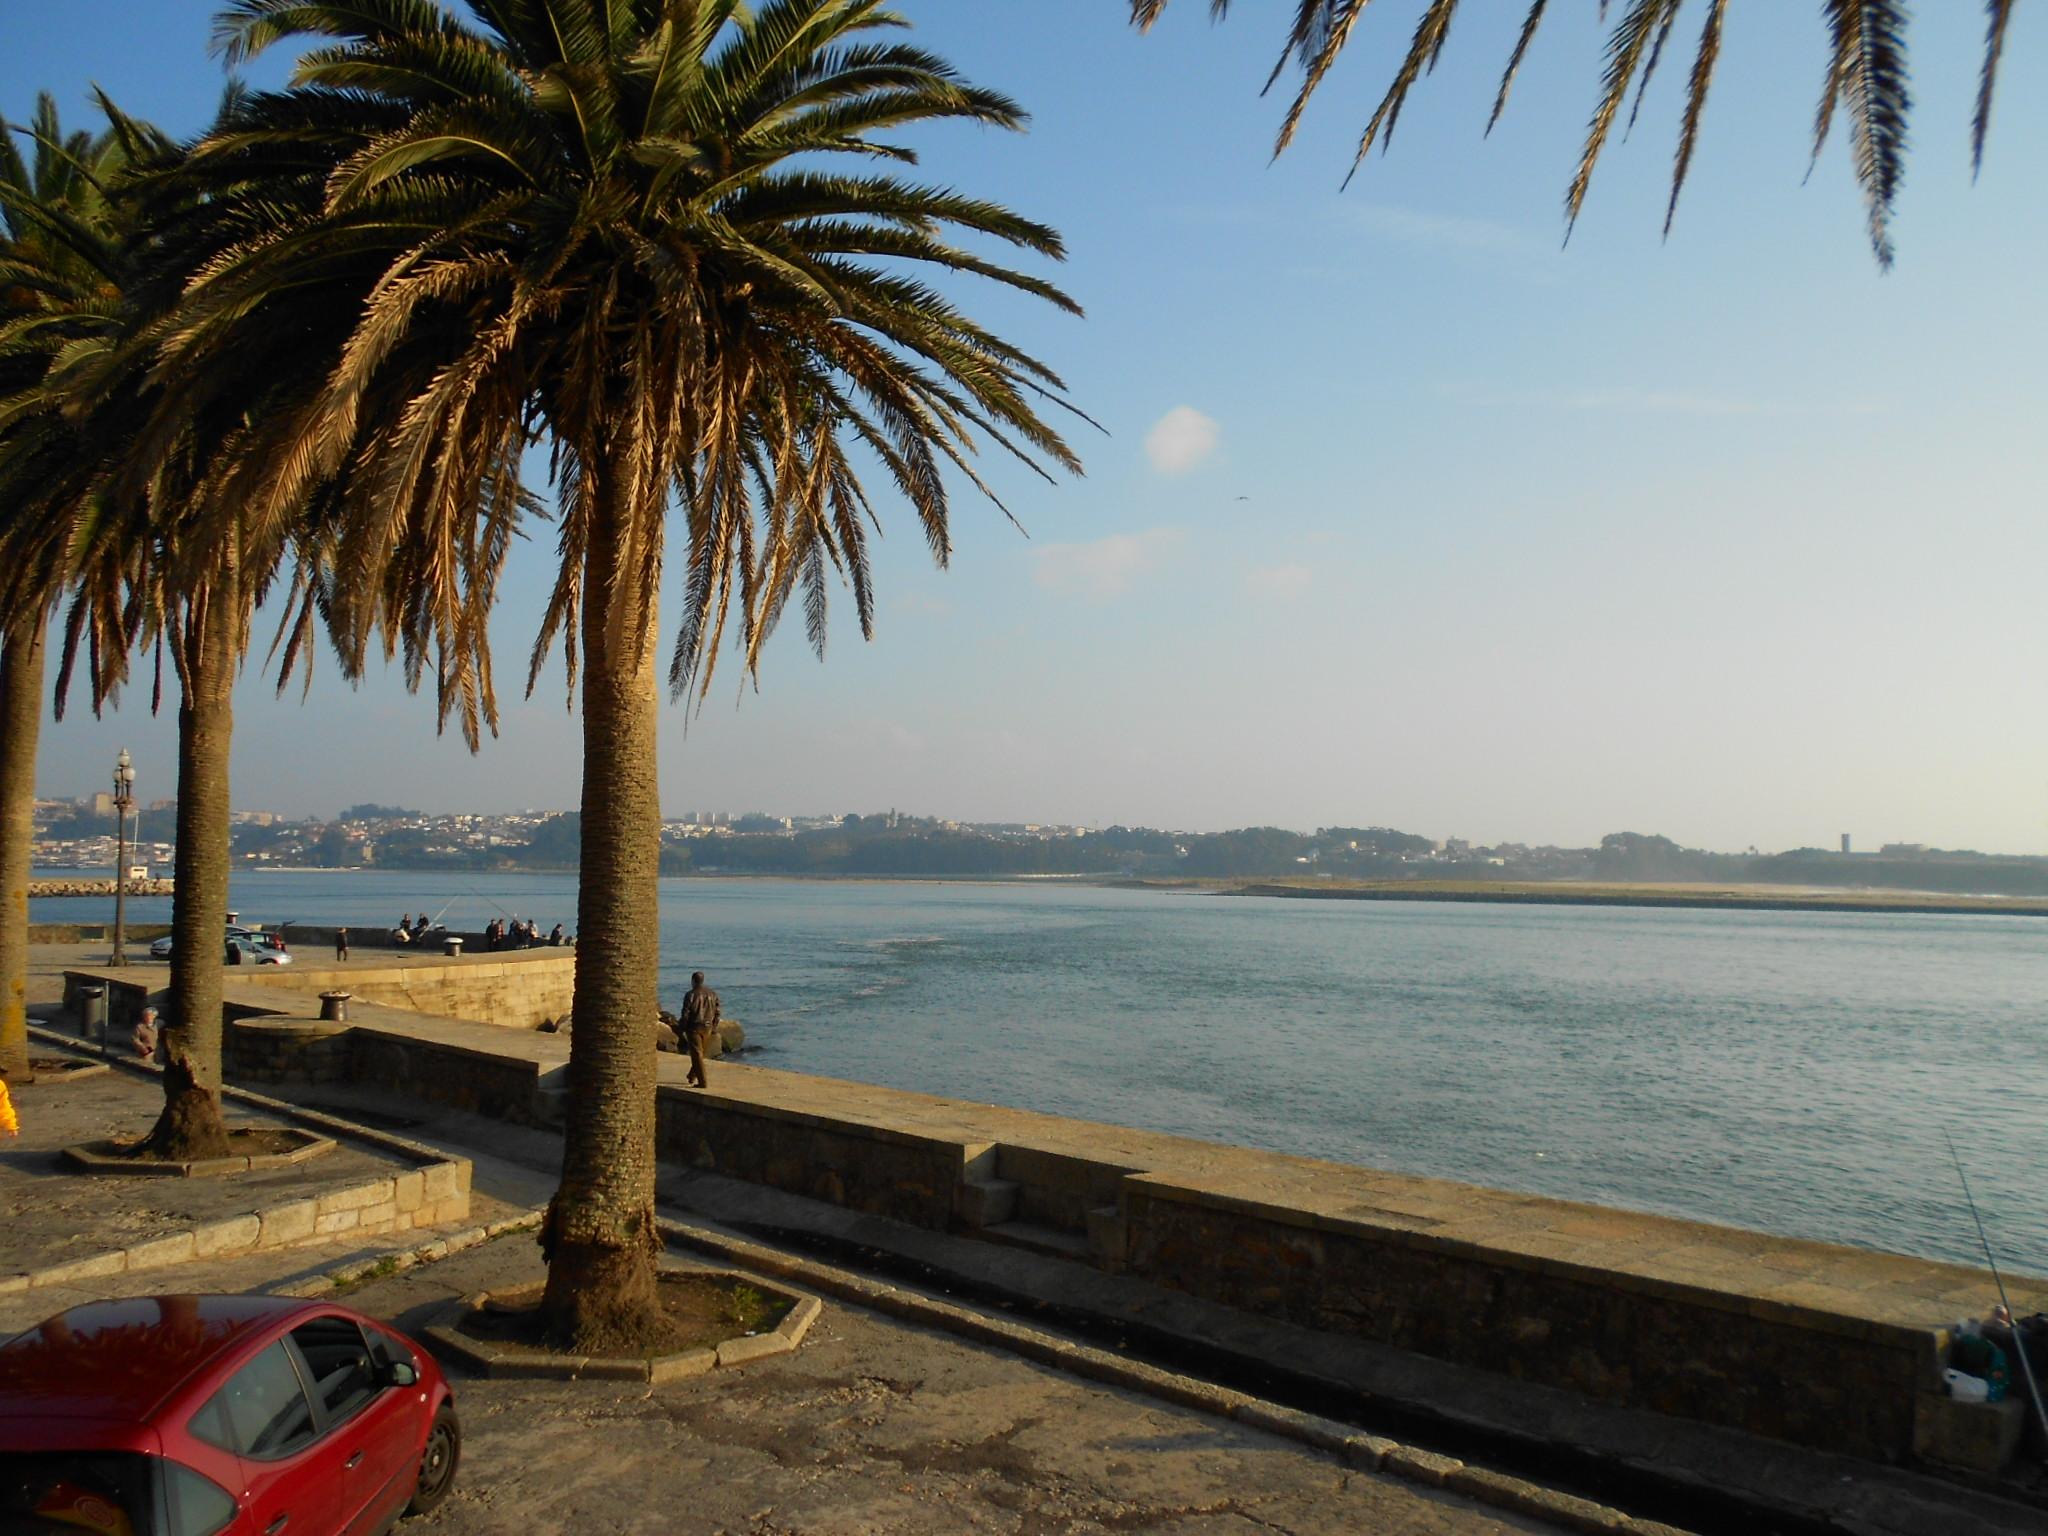 Landscape from sea, Landscape, Palms, Portugal, Sea, HQ Photo